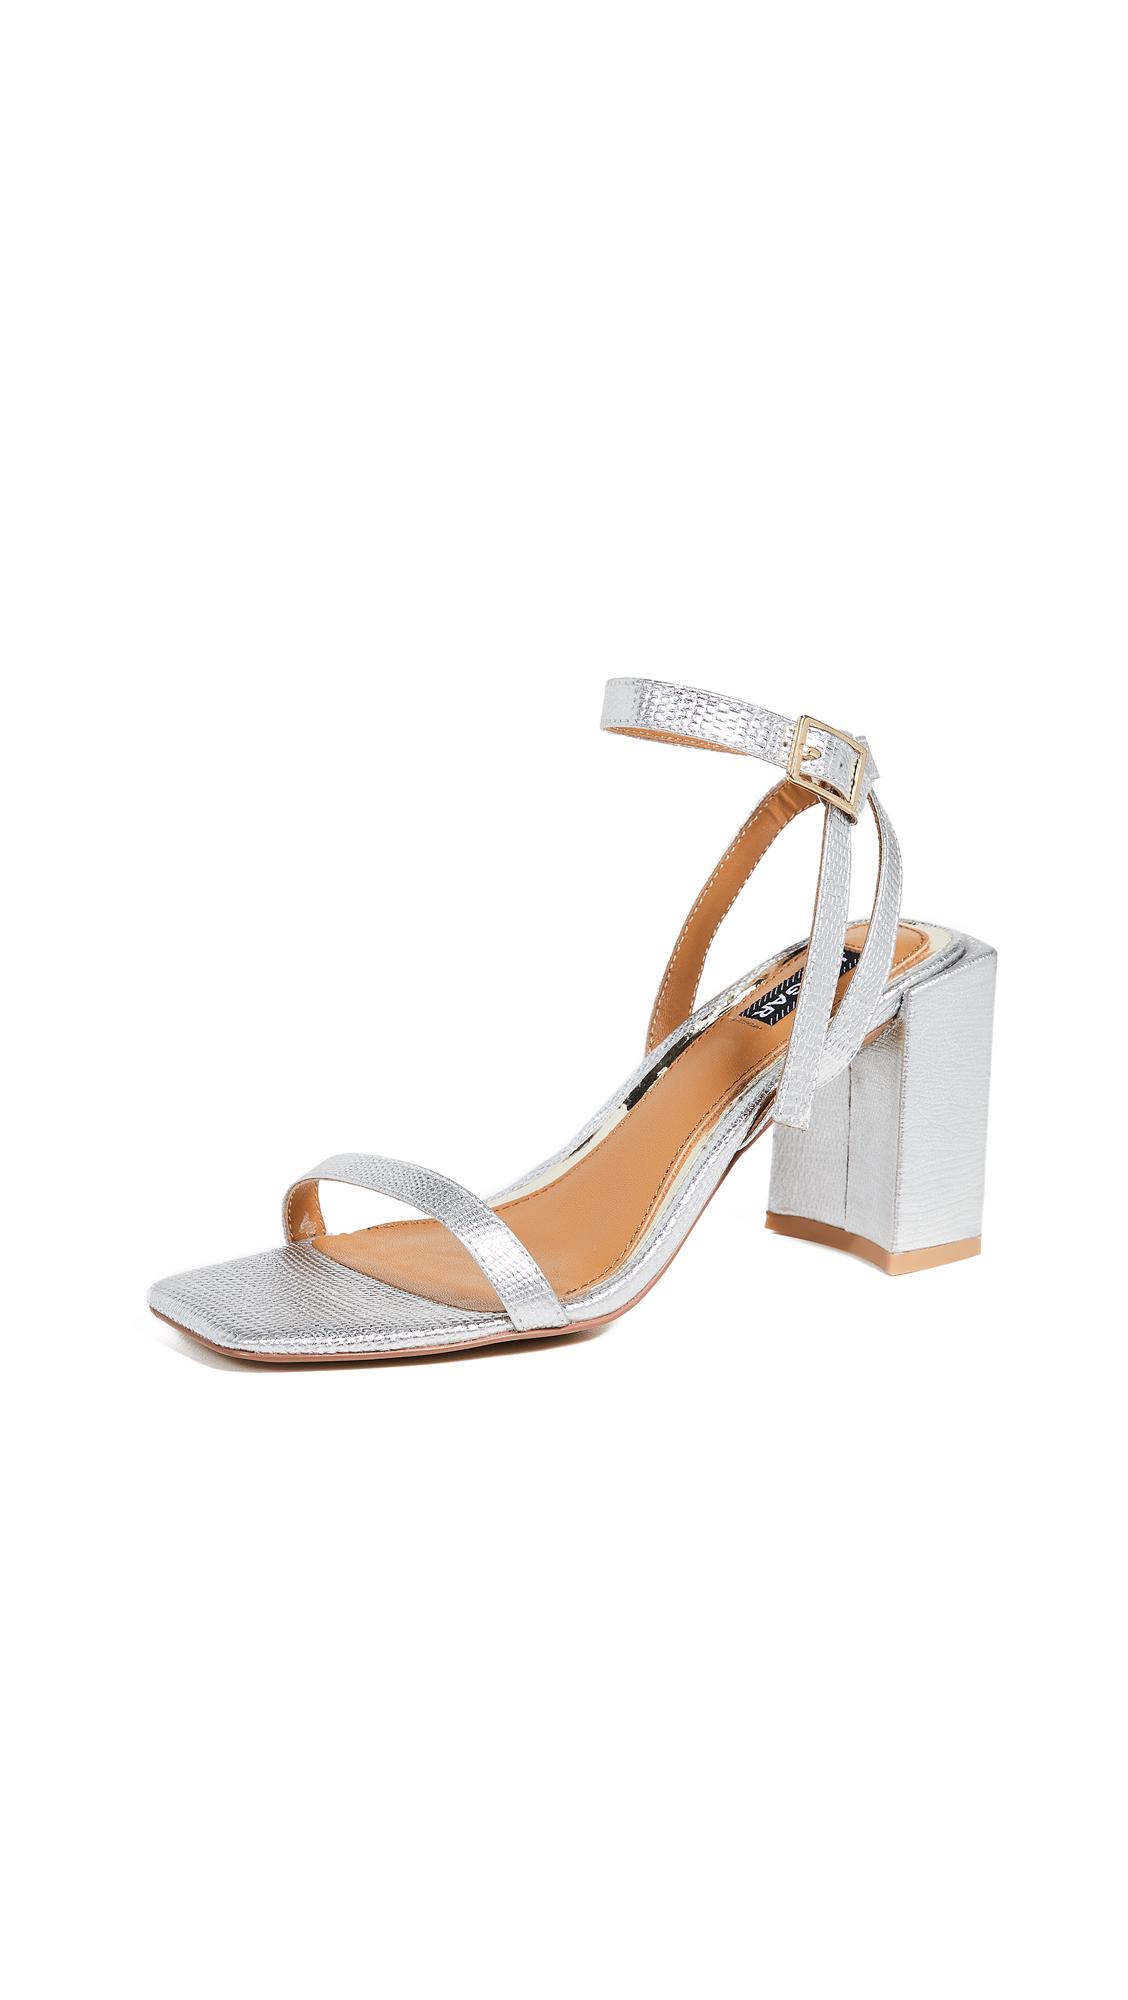 JAGGAR Essential Lizard Heel Sandals - Silver